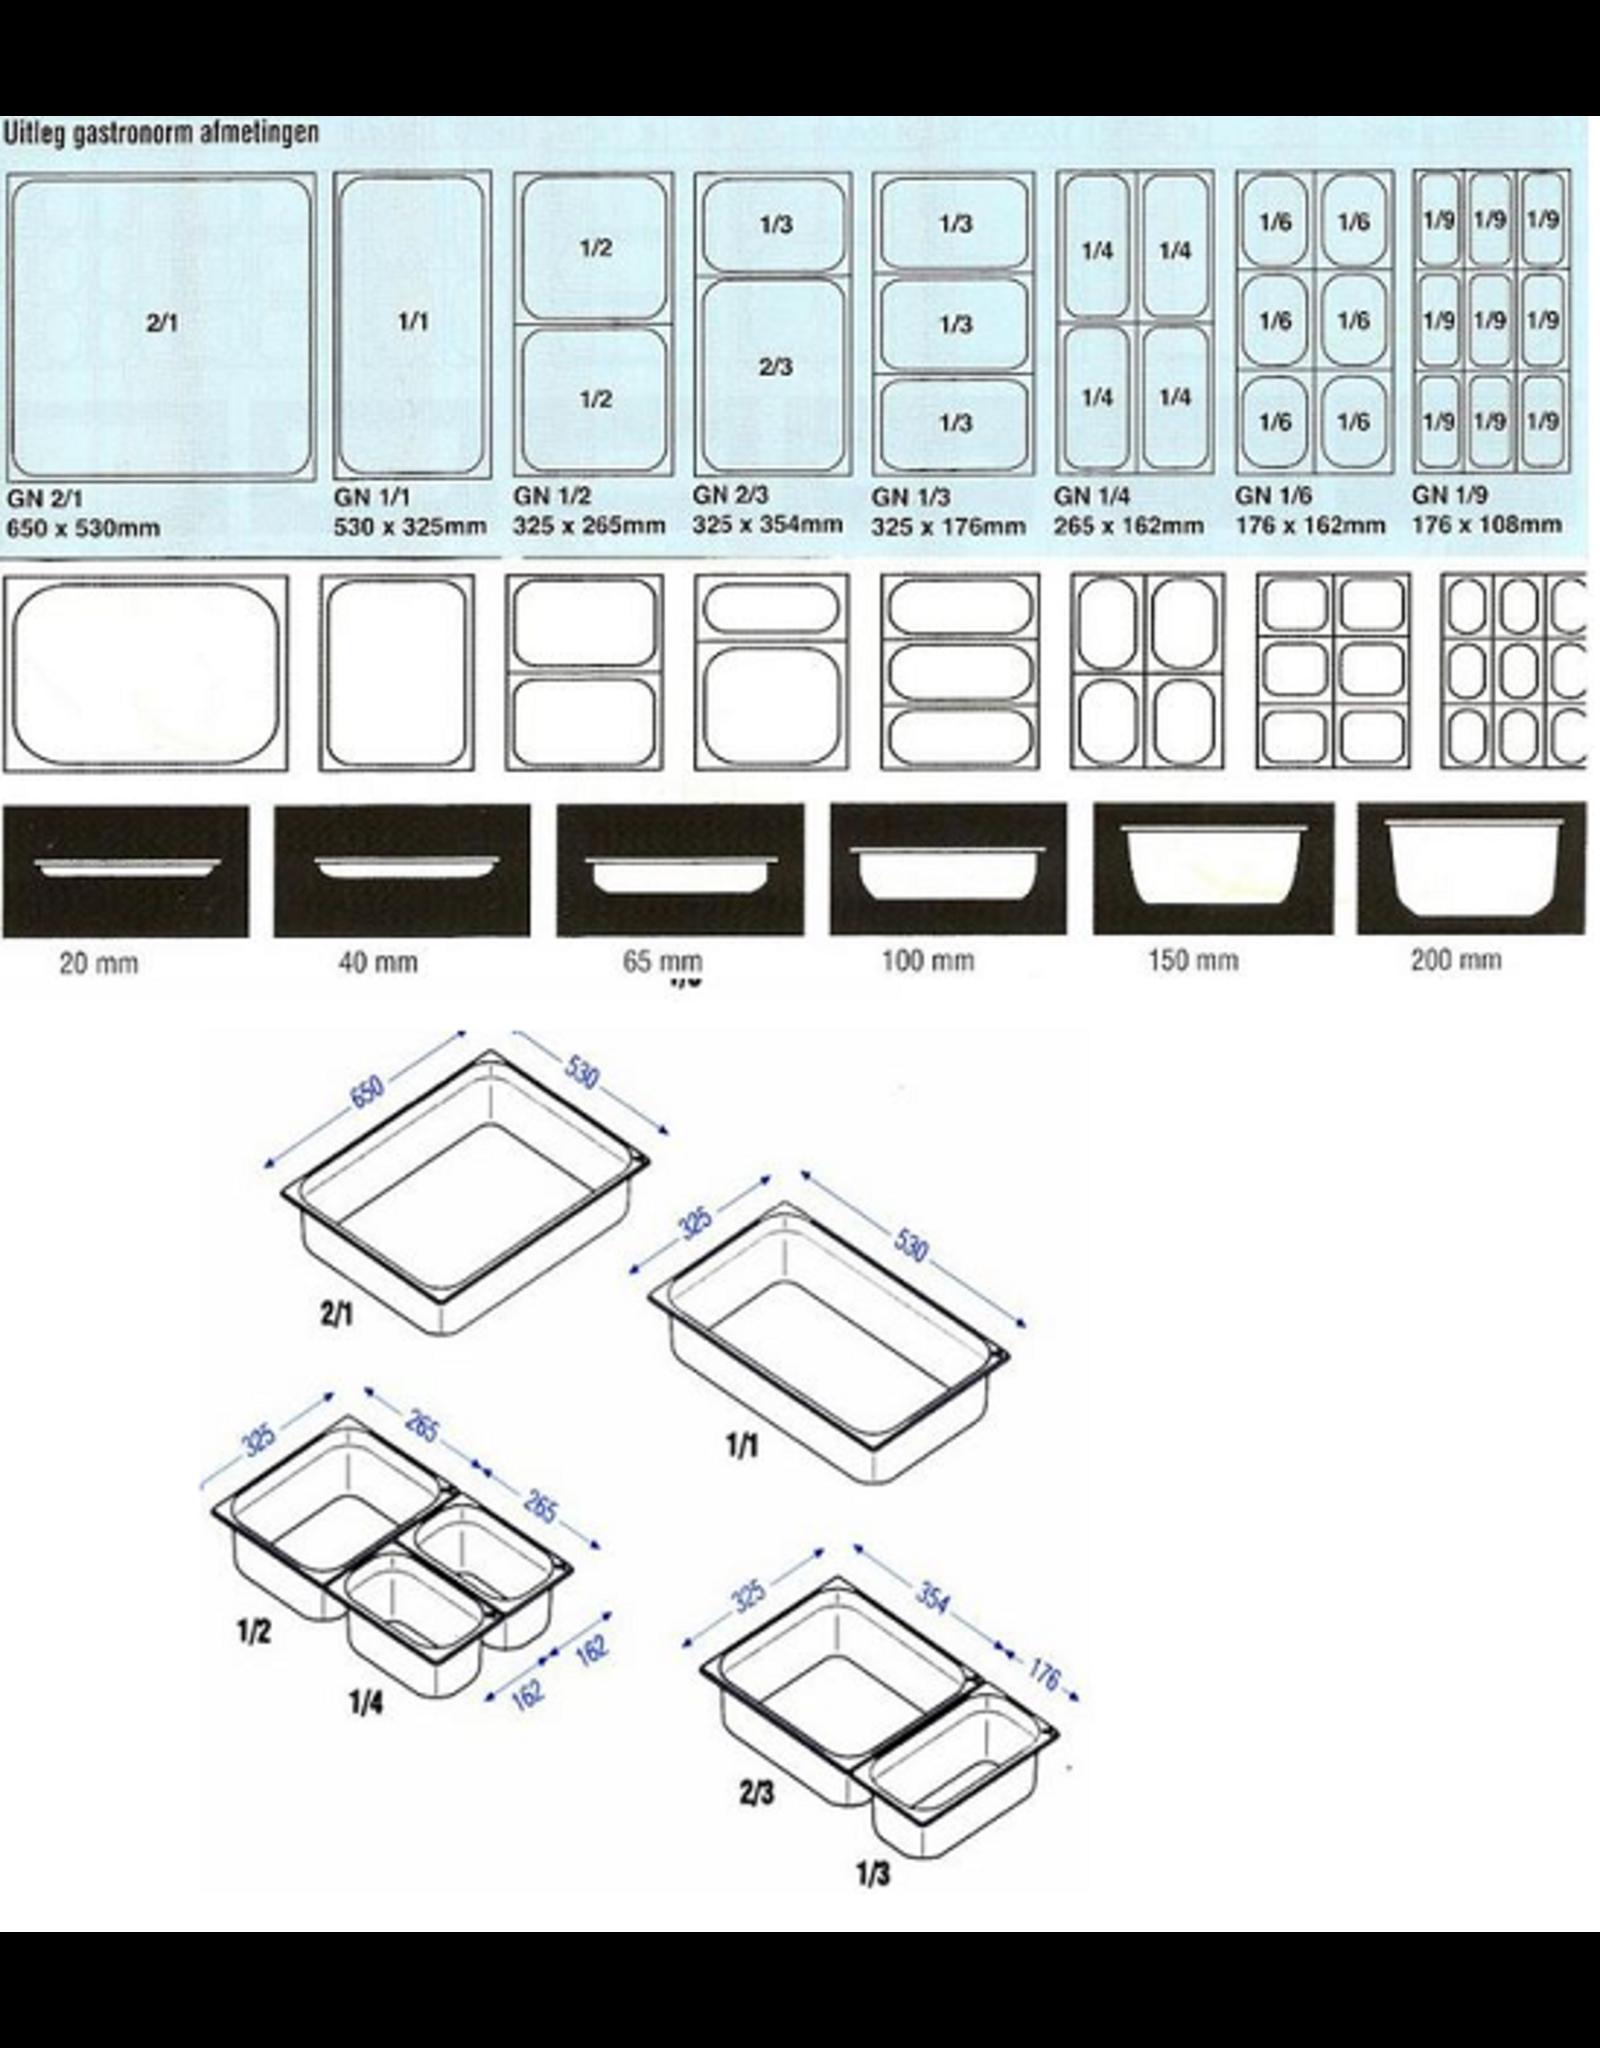 Q-Gastro Gastronorm Bak RVS 1/1GN | 200mm | 530x325mm